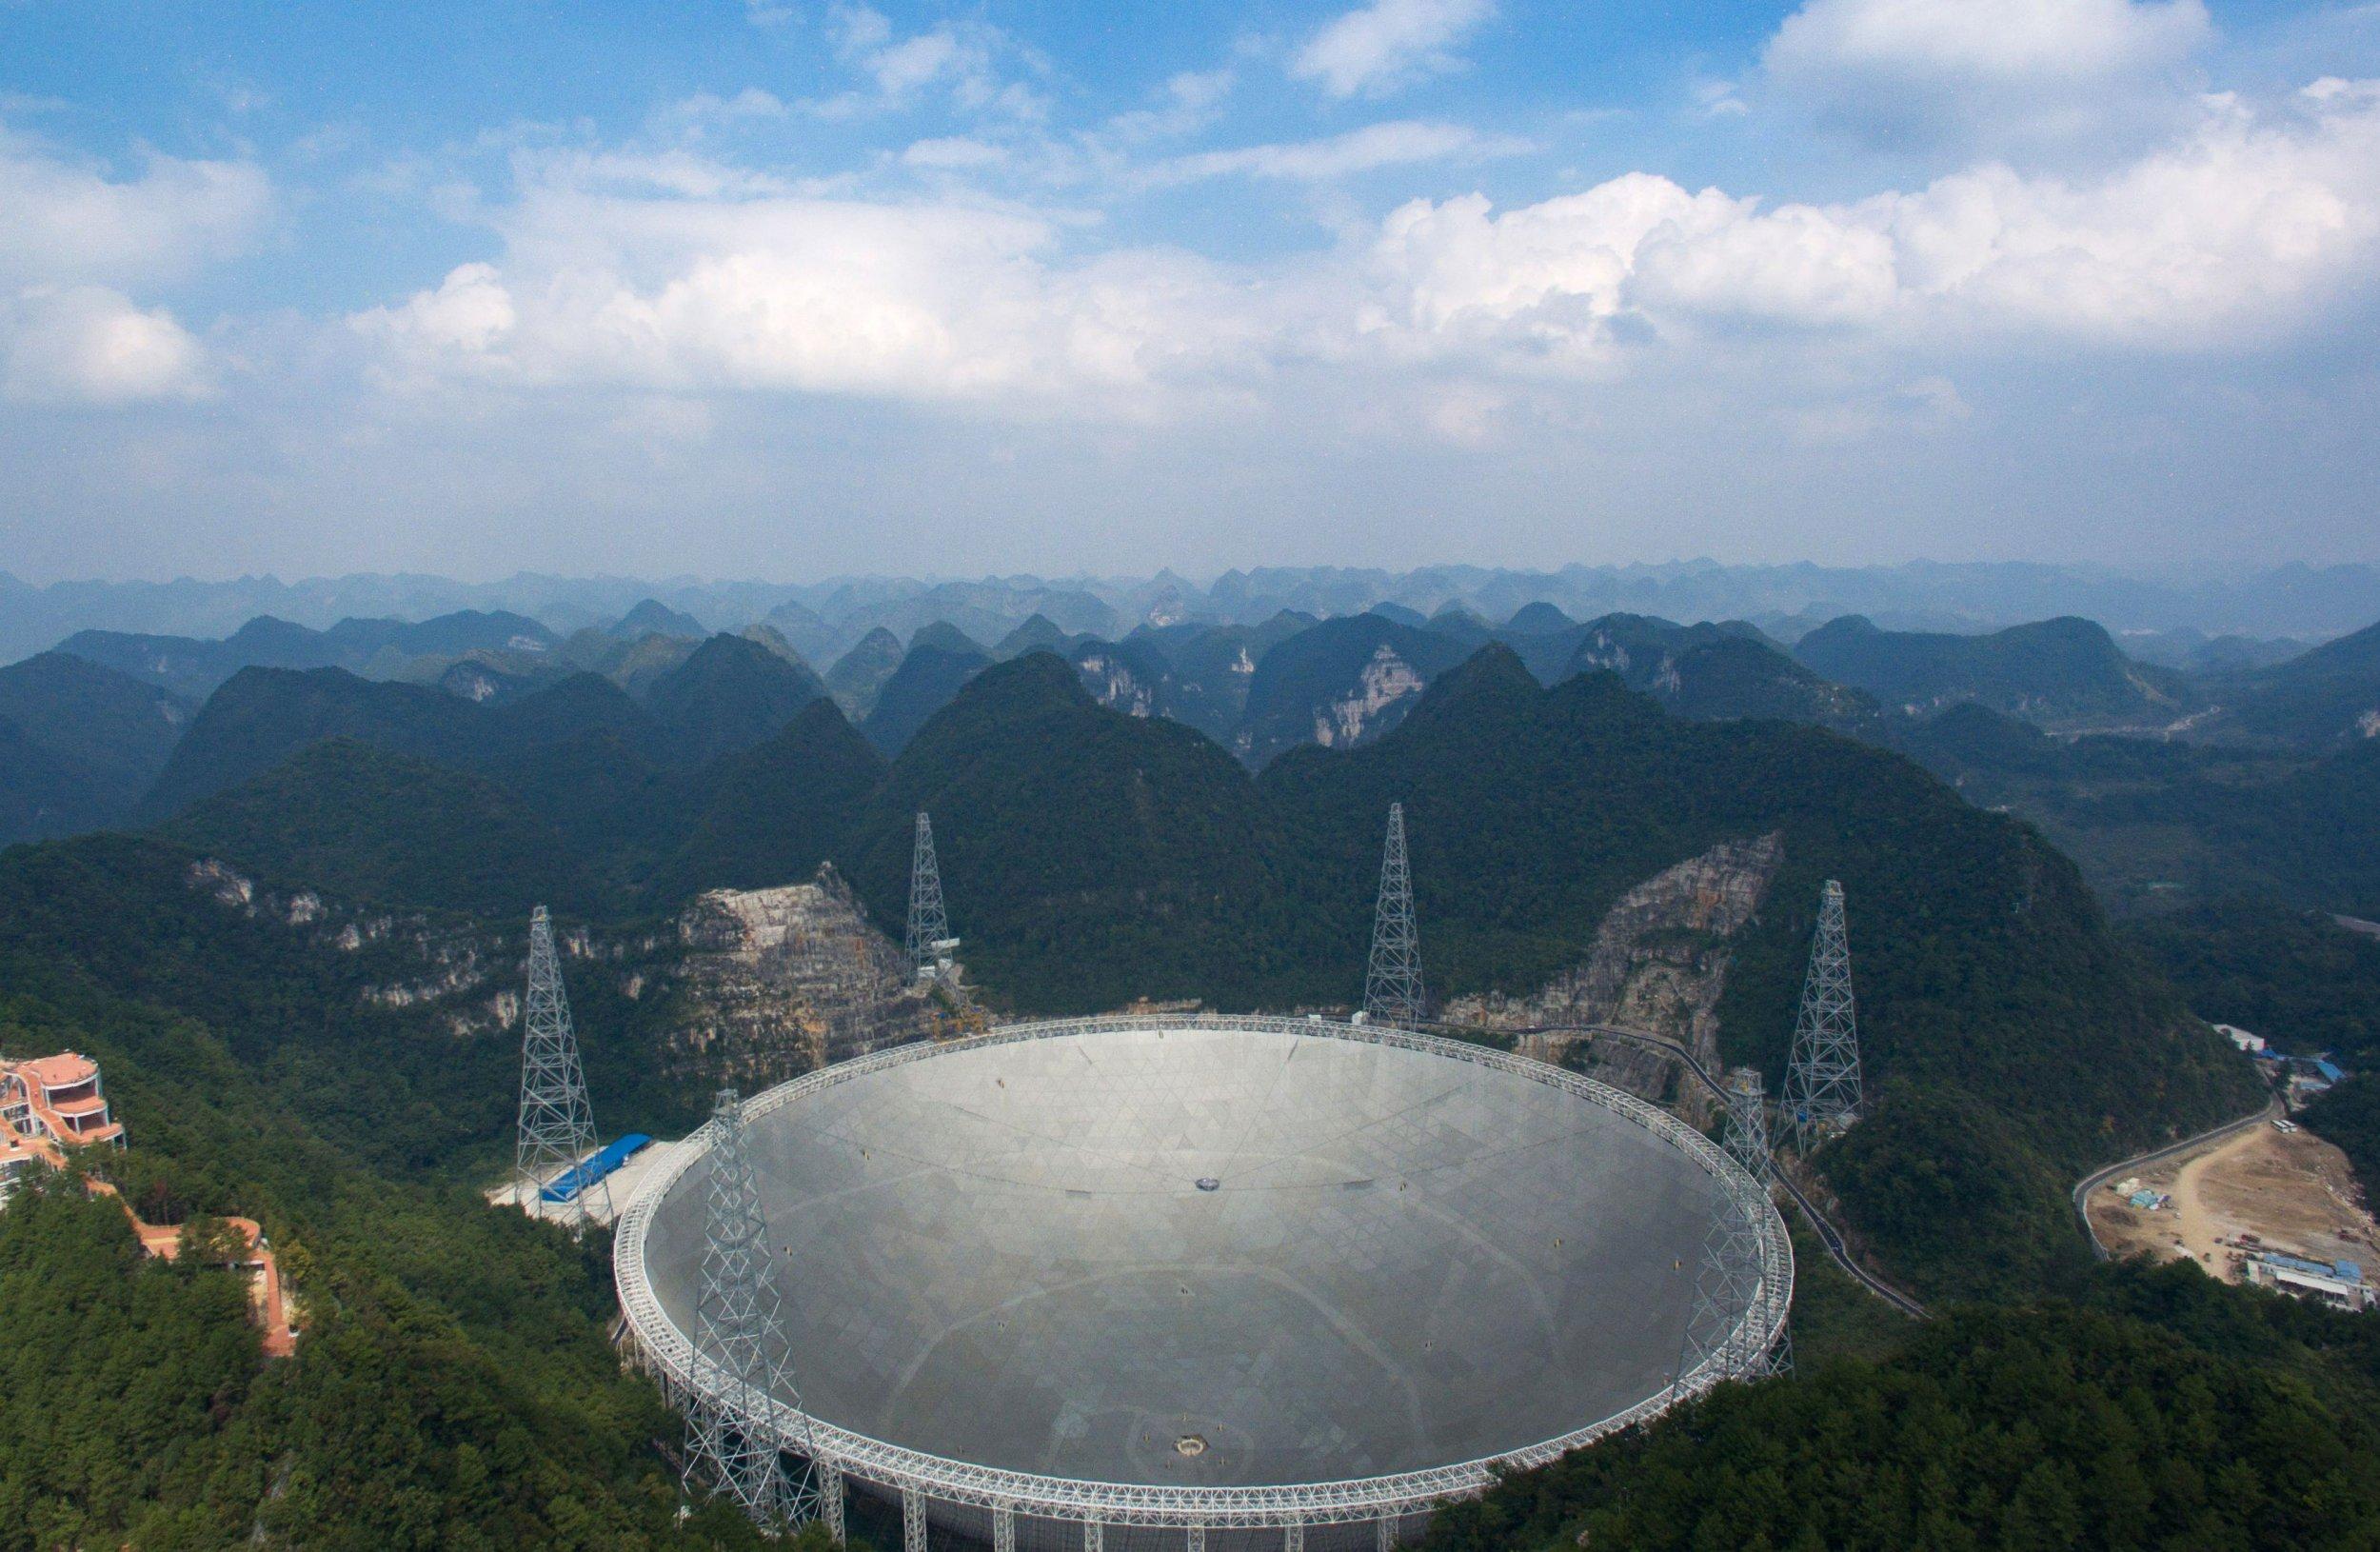 10_10_fast telescope